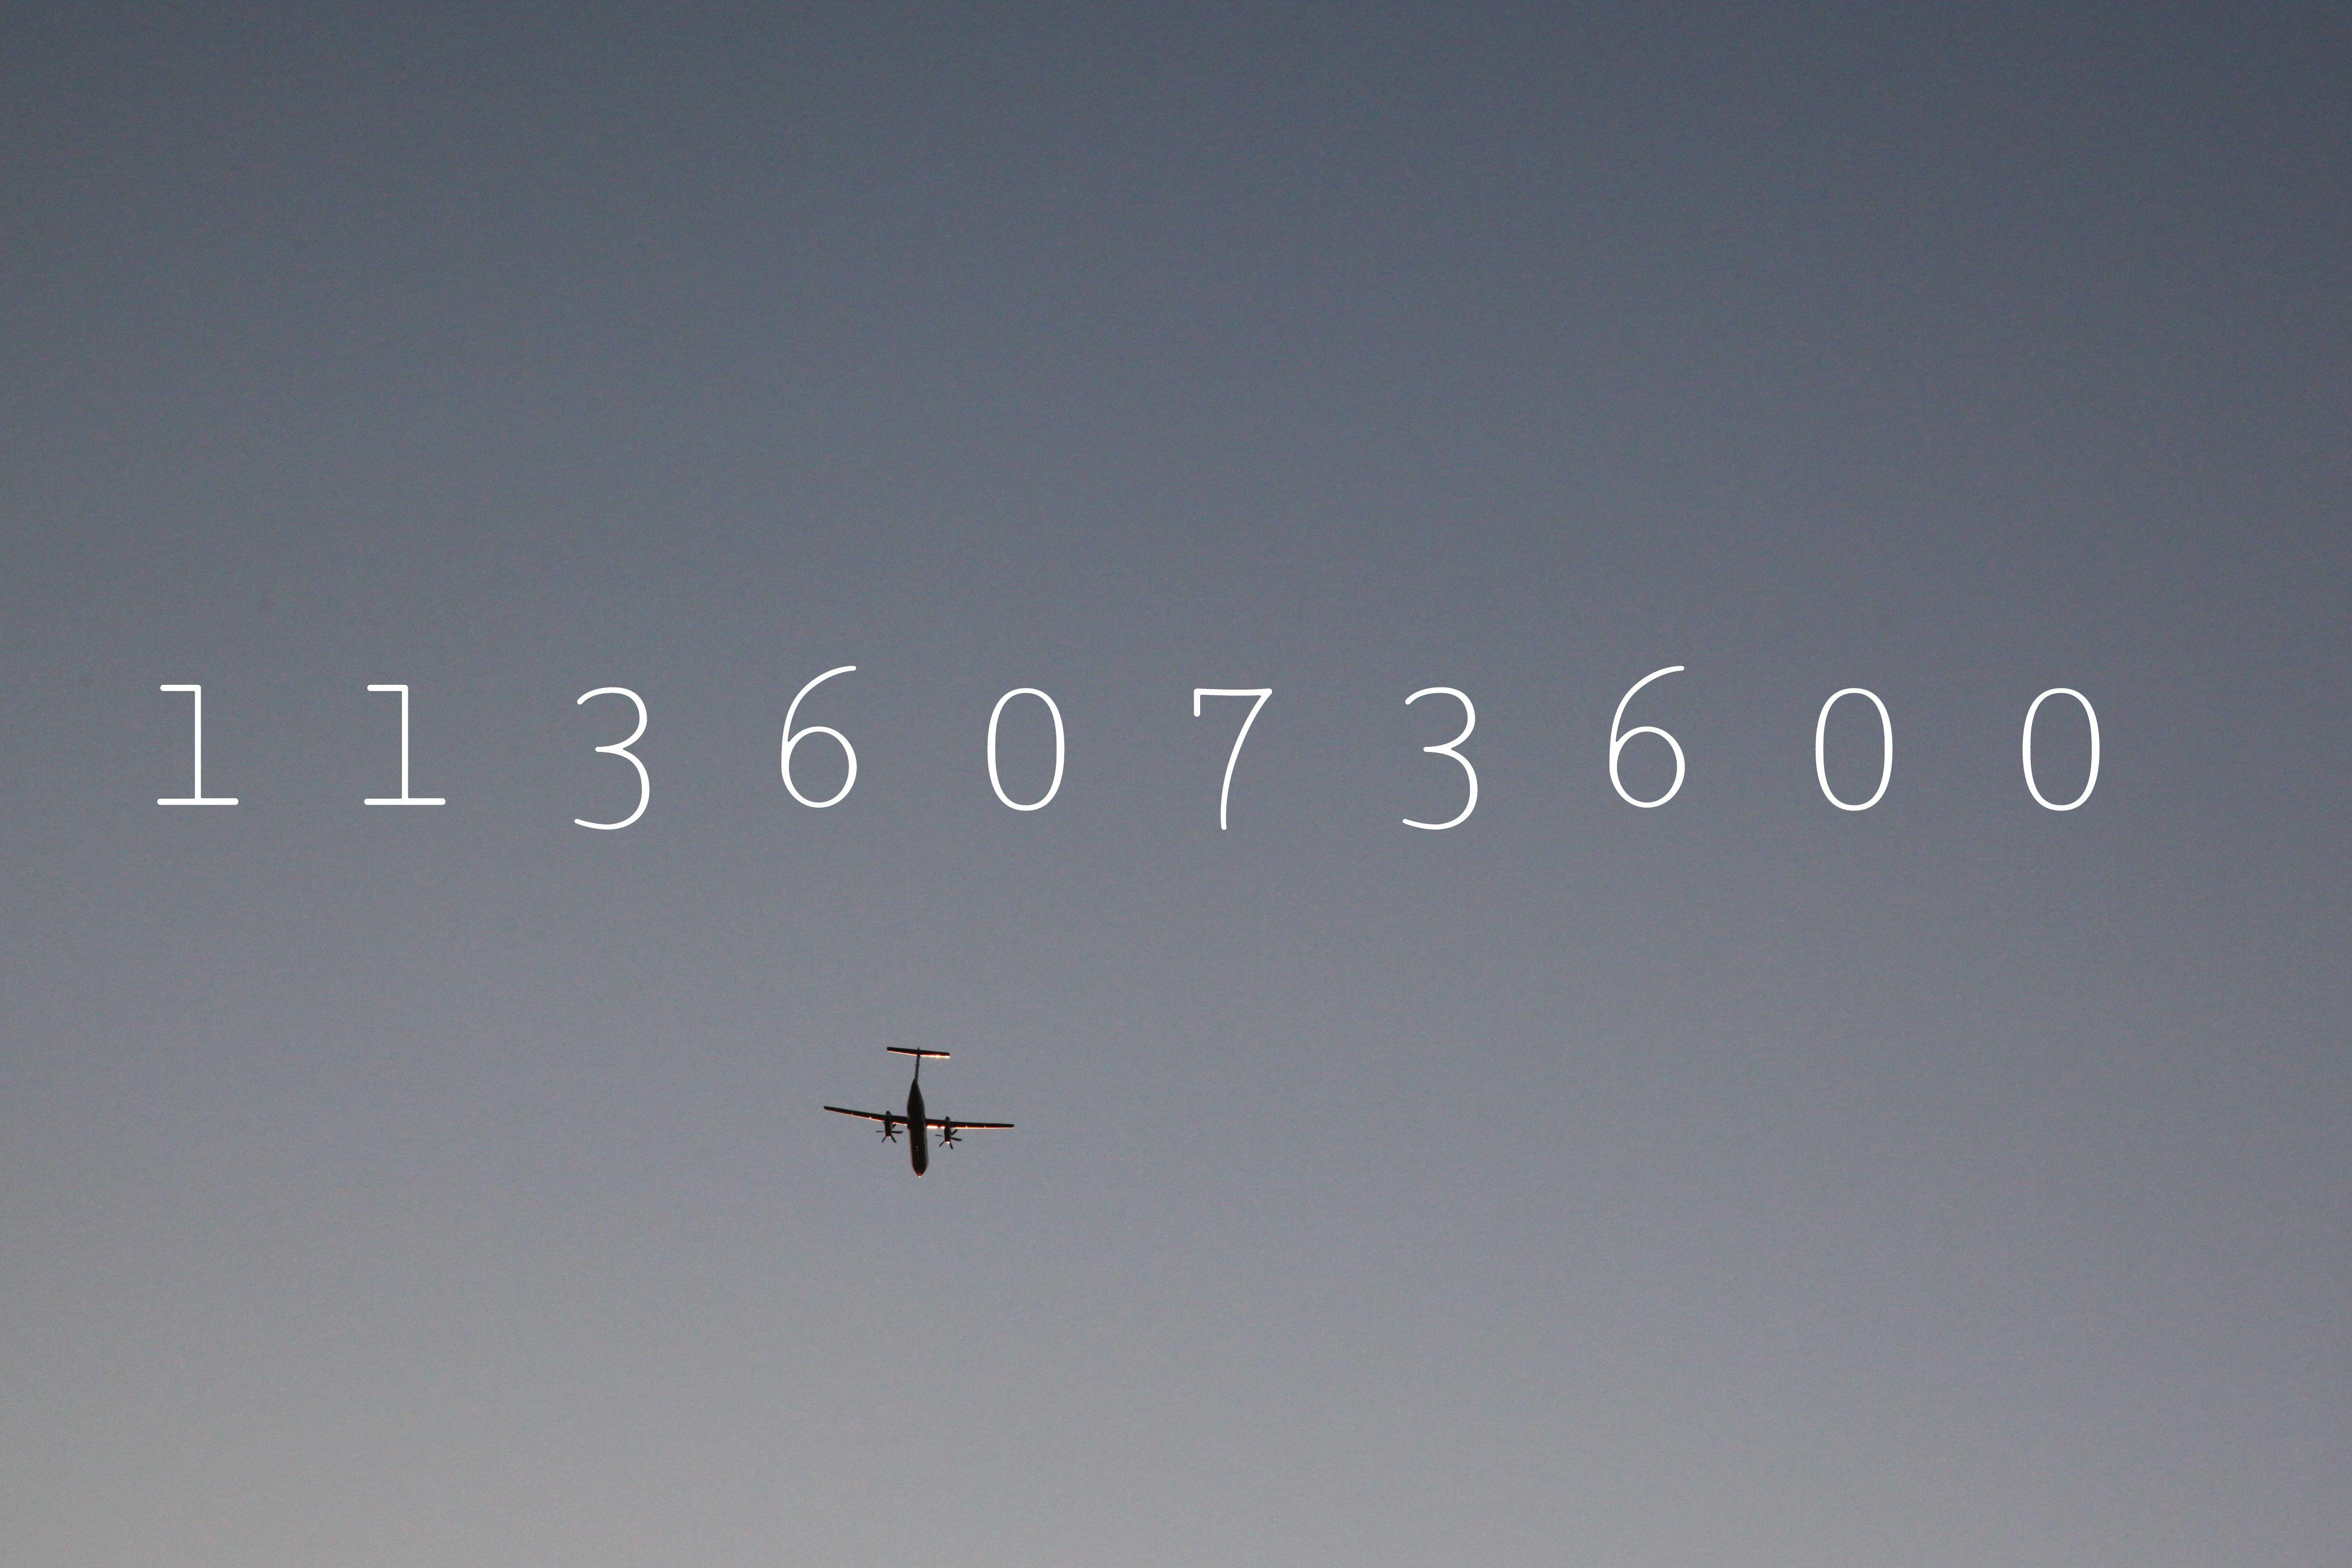 Leap Second, 31 December 2005 - 23:59:60